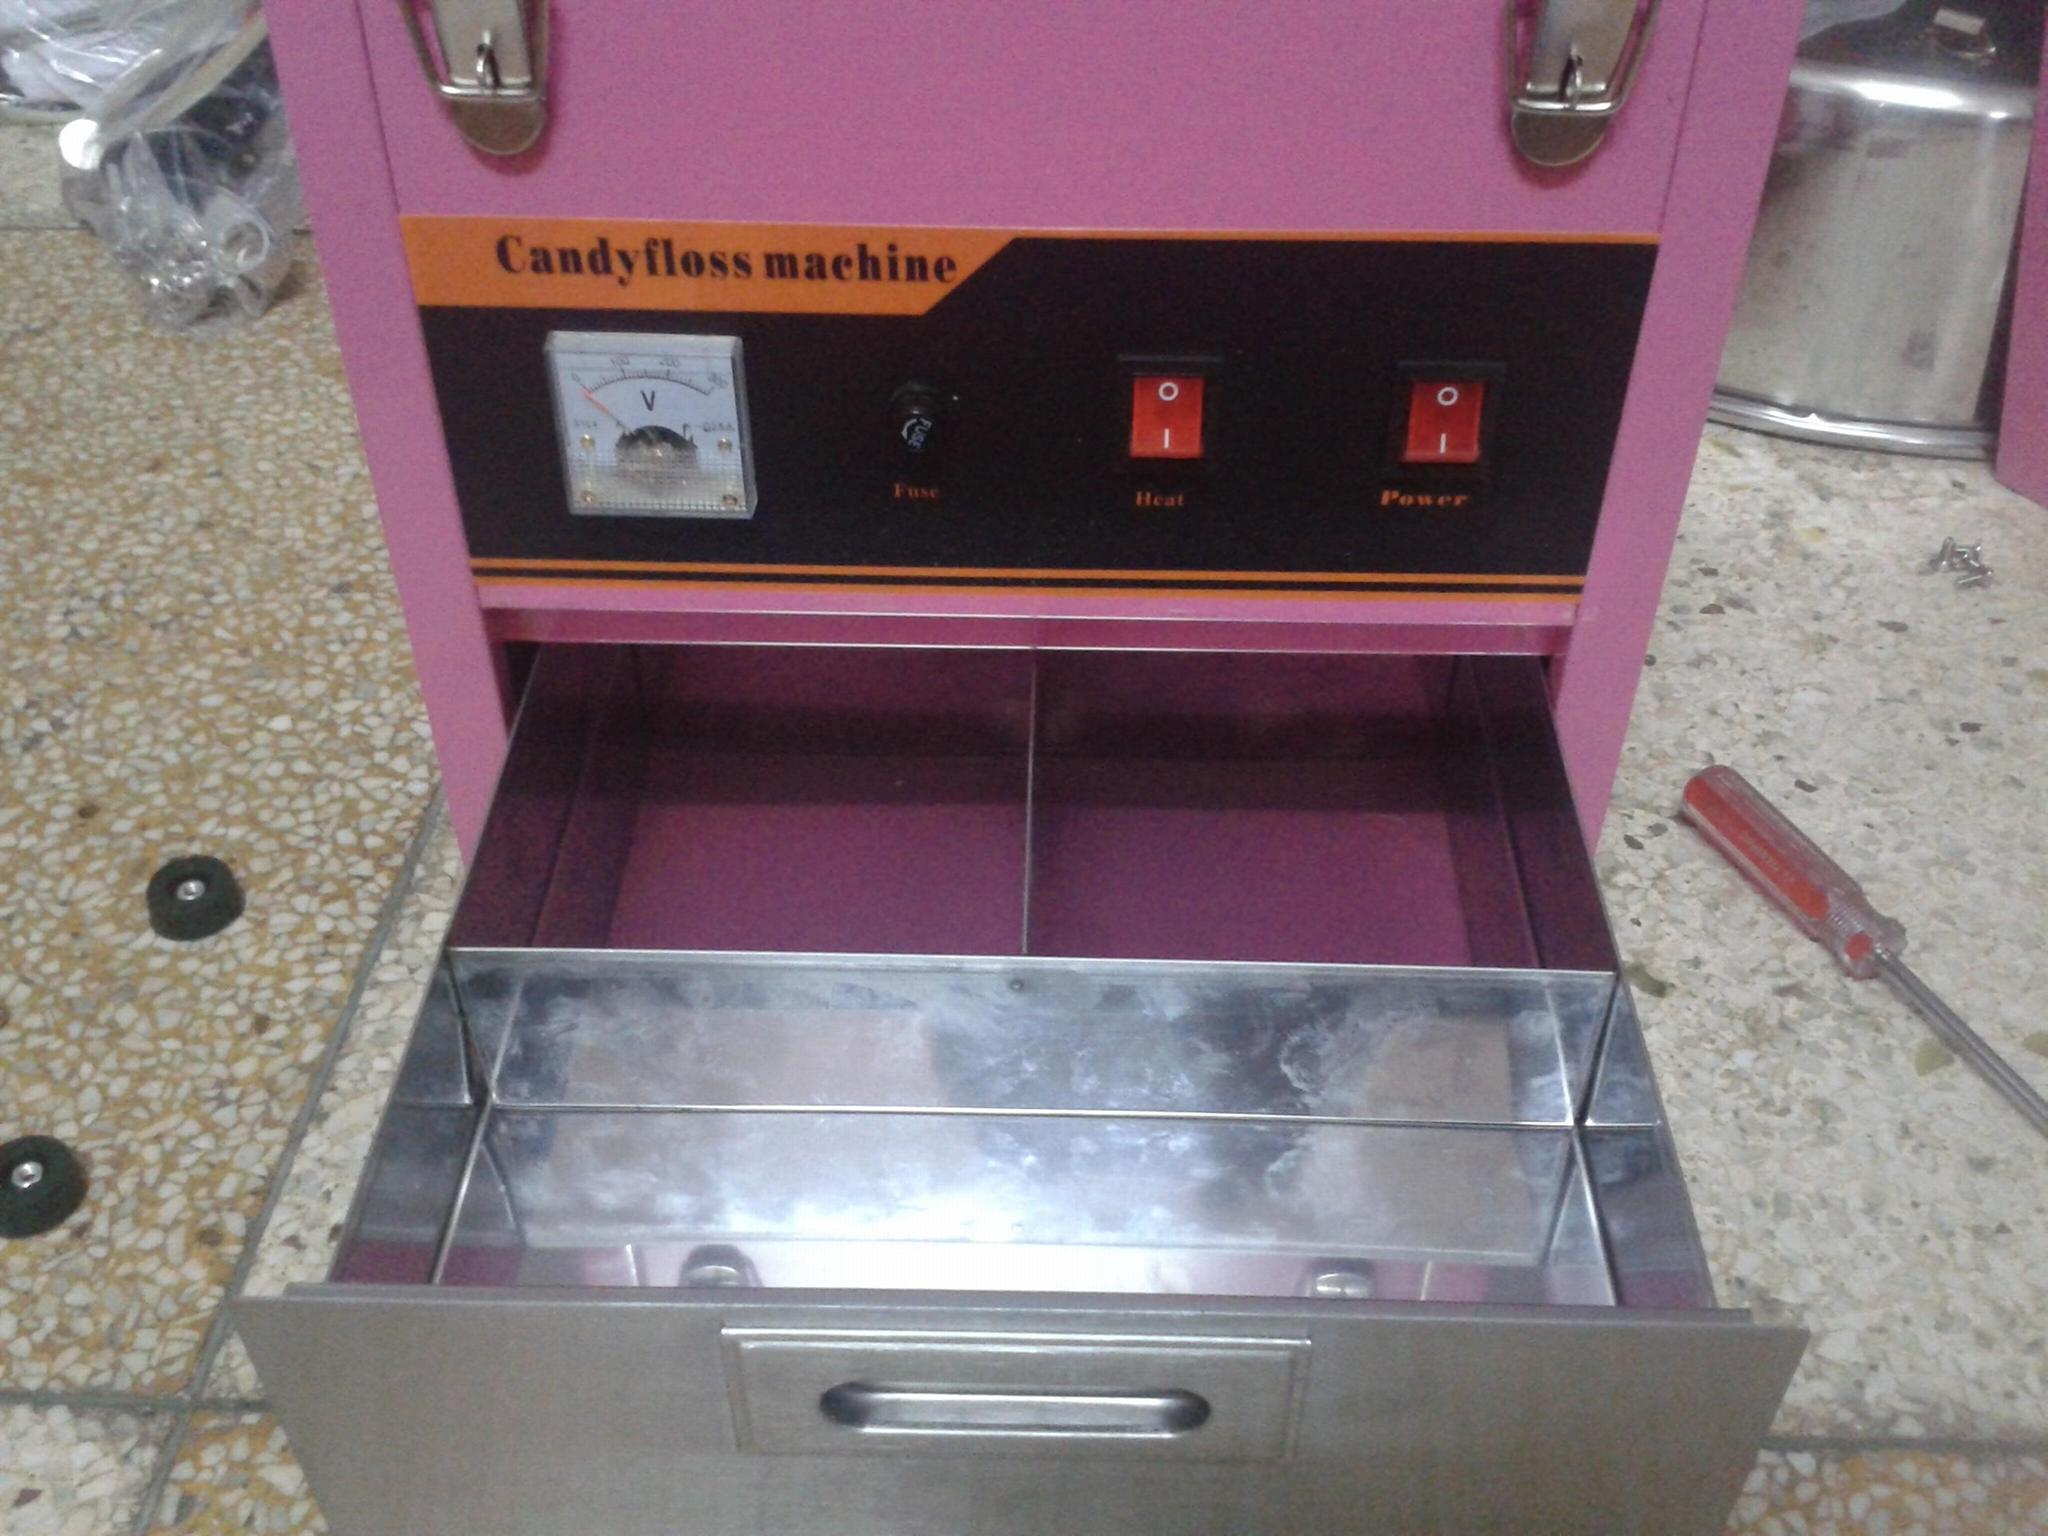 220V 商用棉花糖机 彩色棉花糖 4